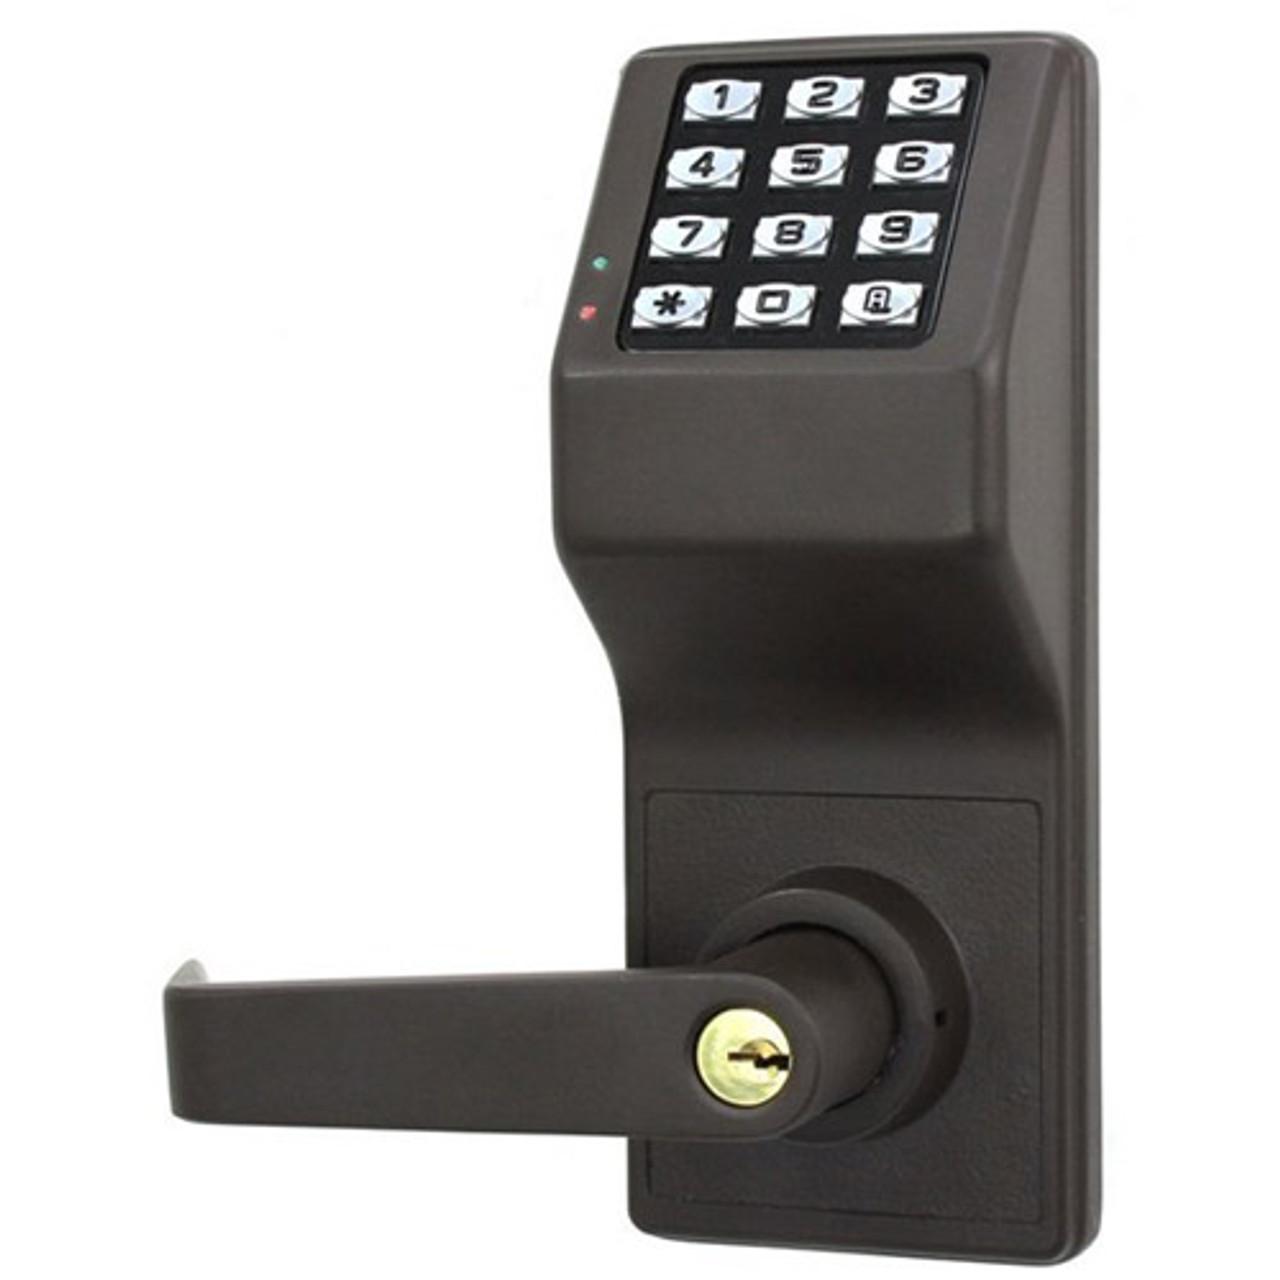 DL3000WPIC-R-US10B Alarm Lock Trilogy Electronic Digital Lock in Duronodic Finish